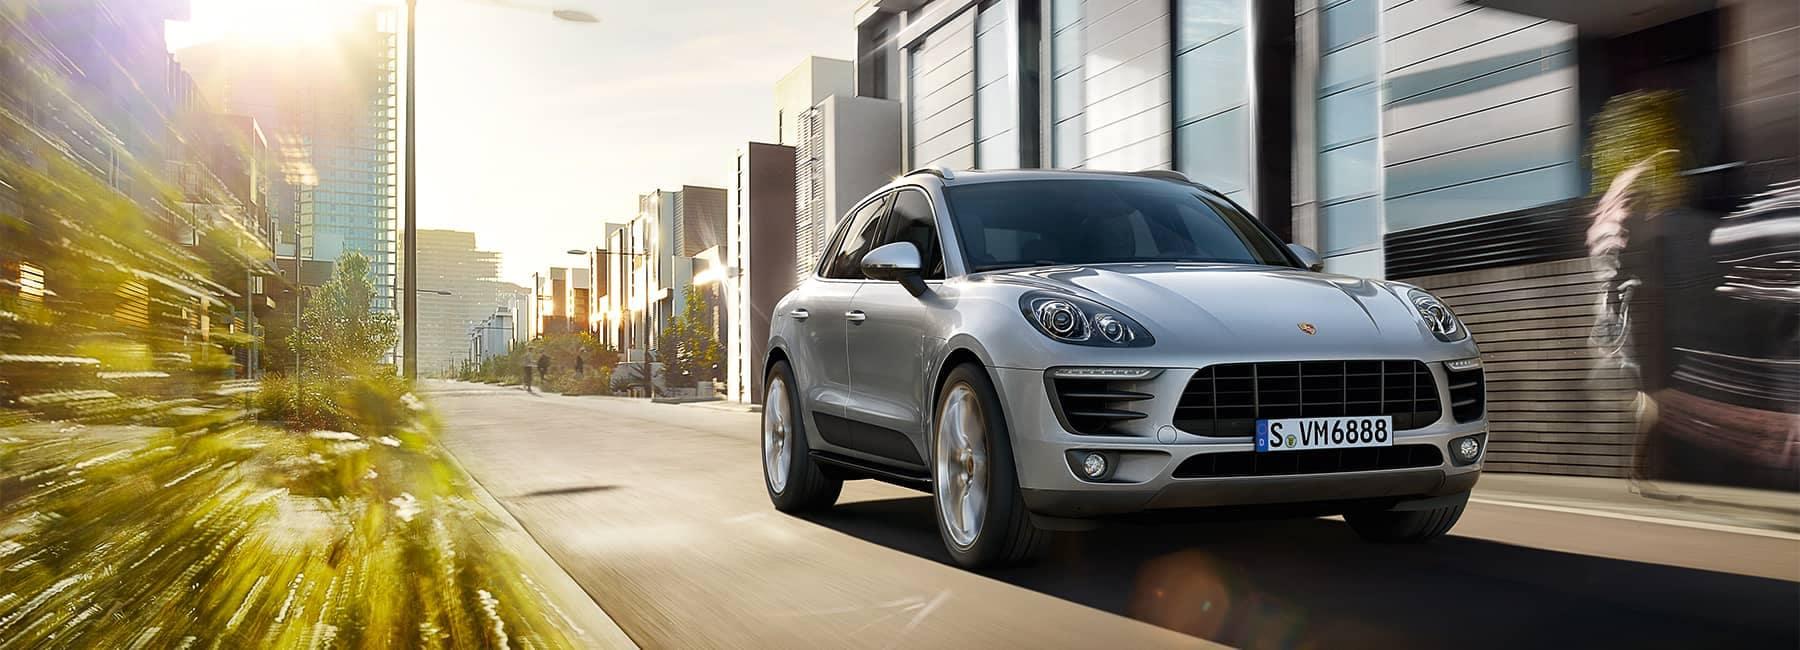 Porsche Macan Lease >> Porsche Macan Lease Offers Town Porsche In Englewood Nj